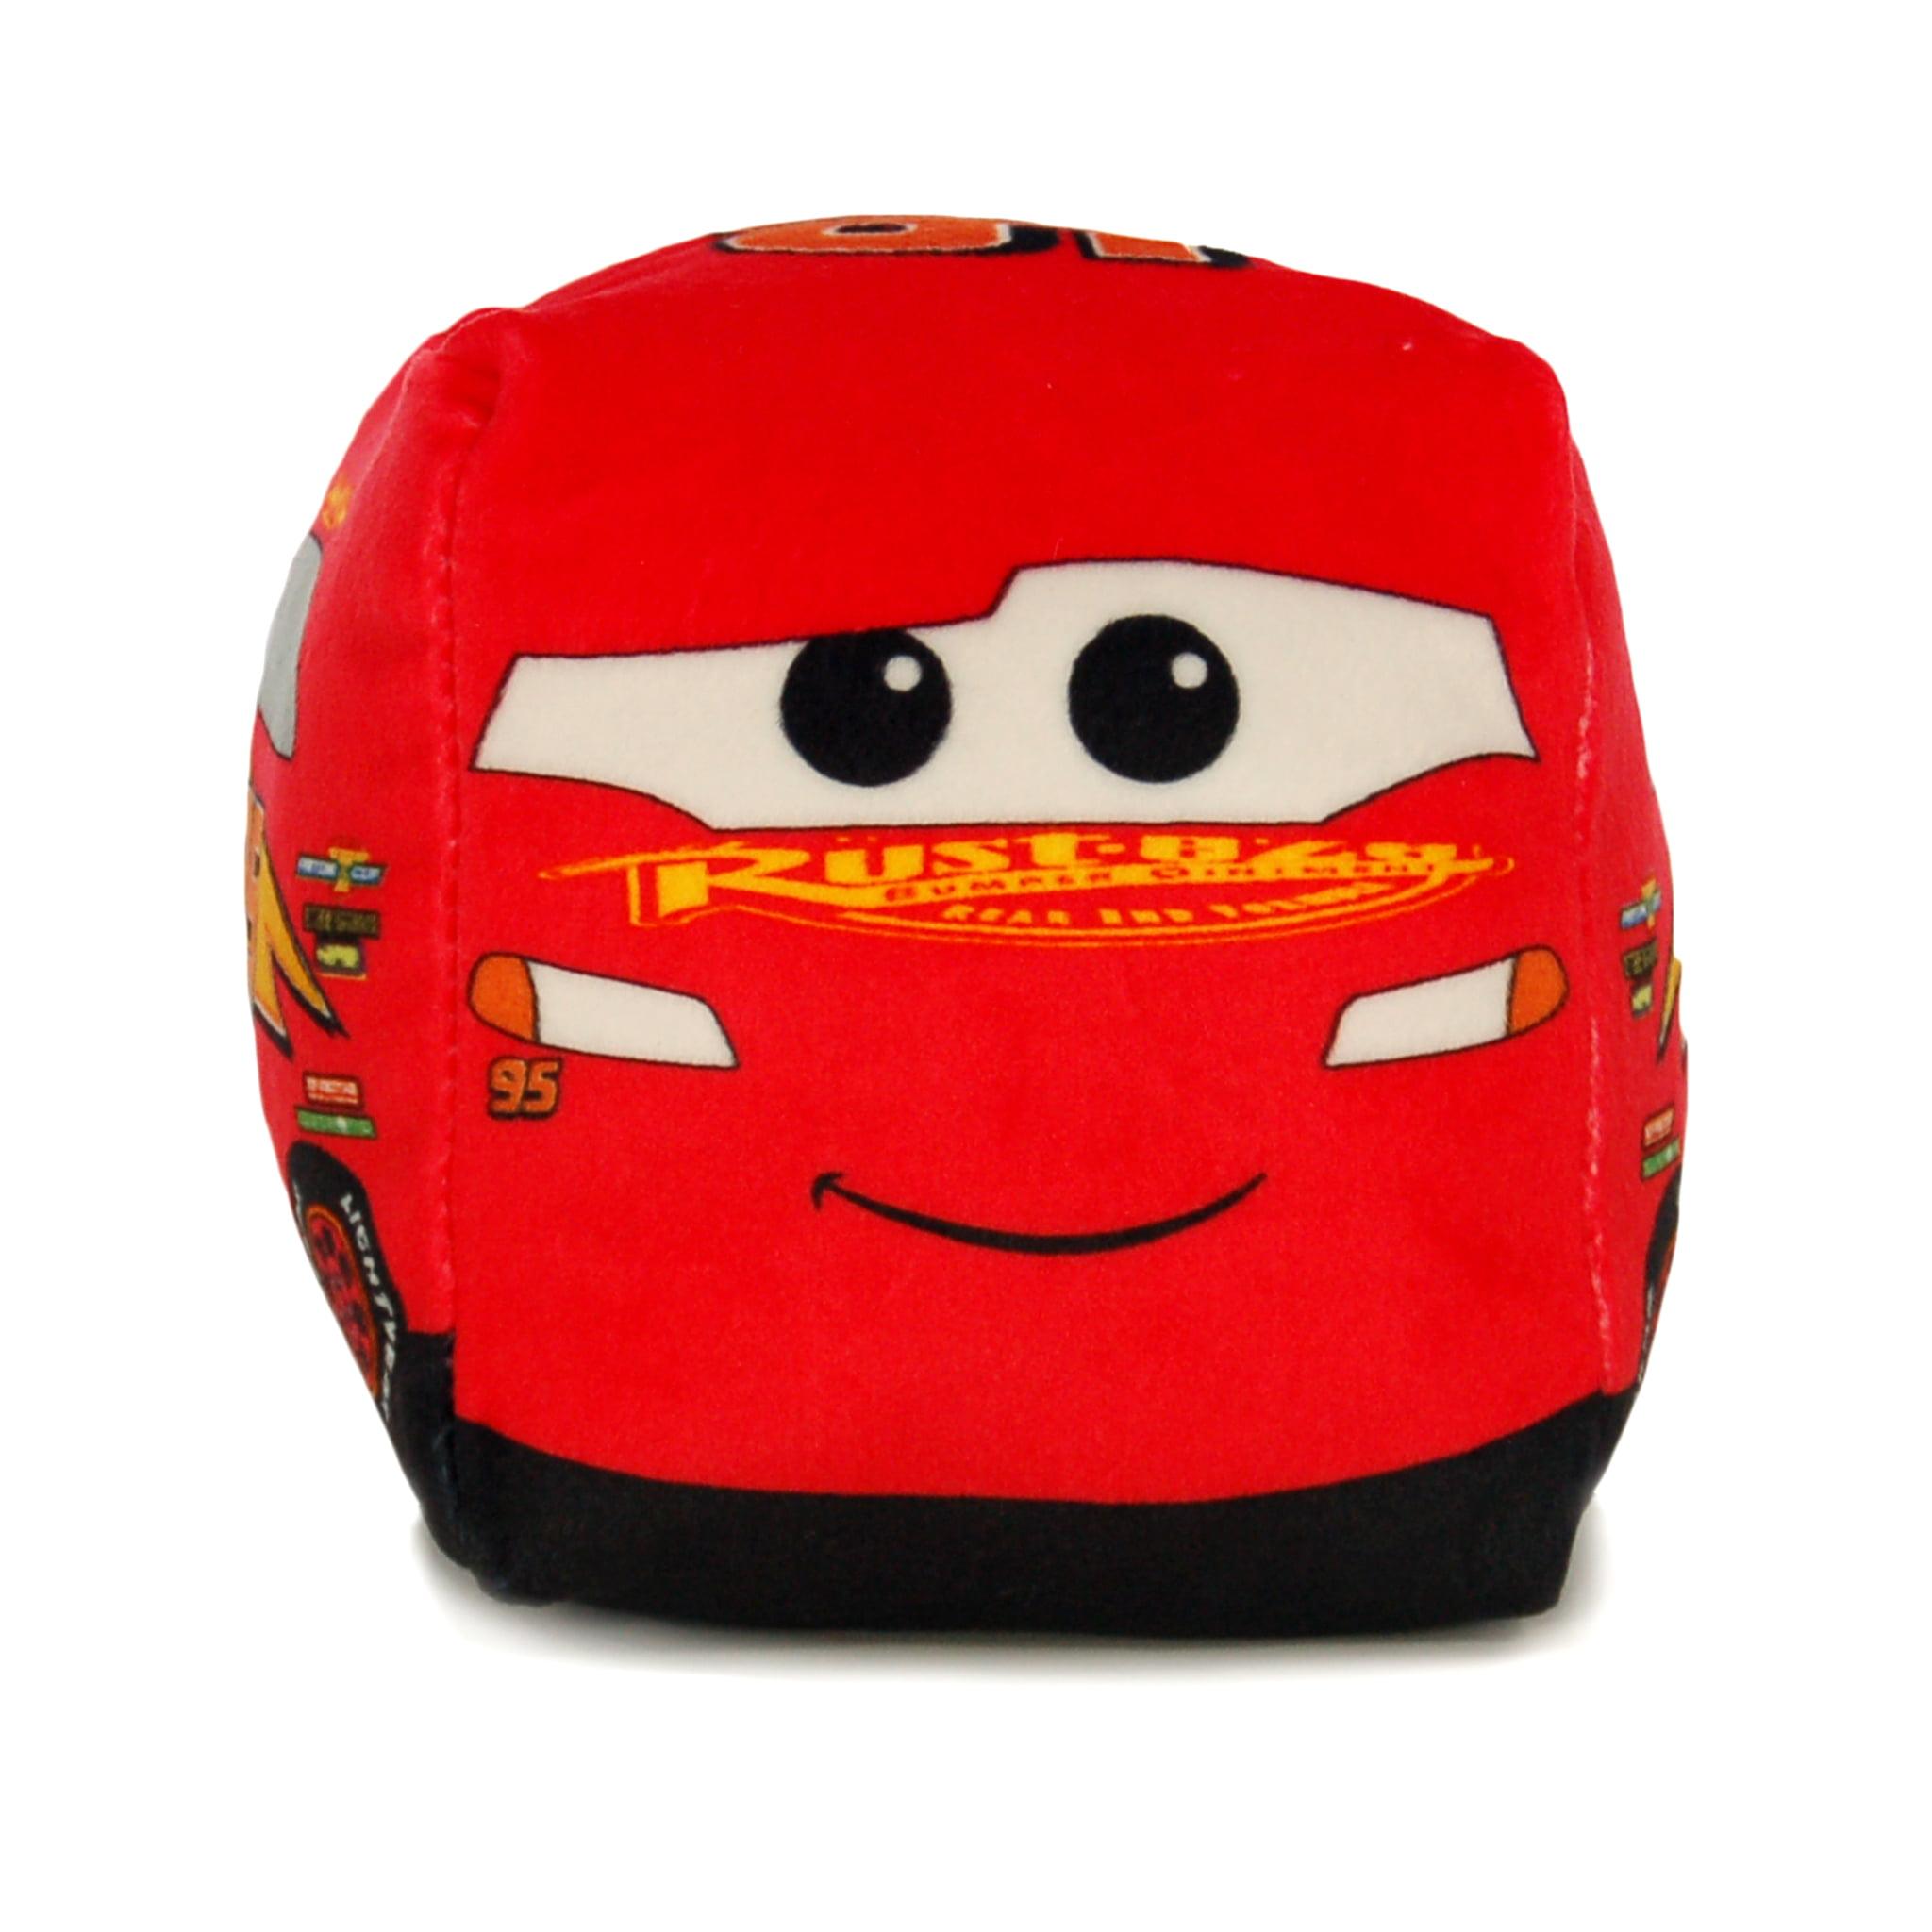 Disney Pixar's Cars McQueen 3D Ultra Stretch Mini Cloud Cube Travel Pillow, 1 Each